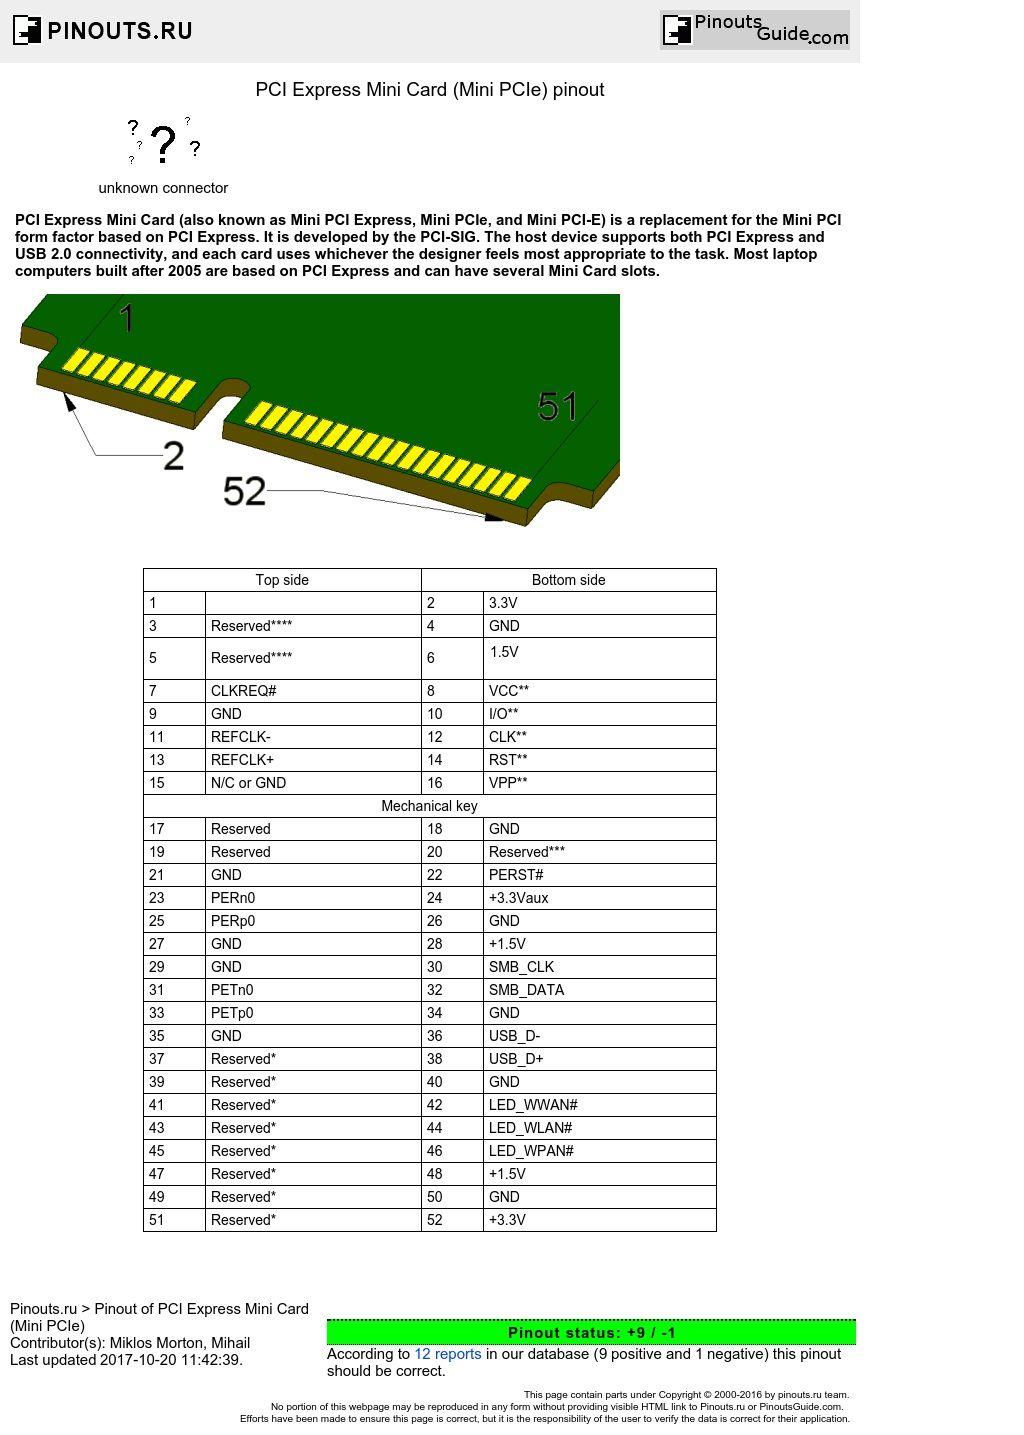 PCI Express Mini Card (Mini PCIe) diagram